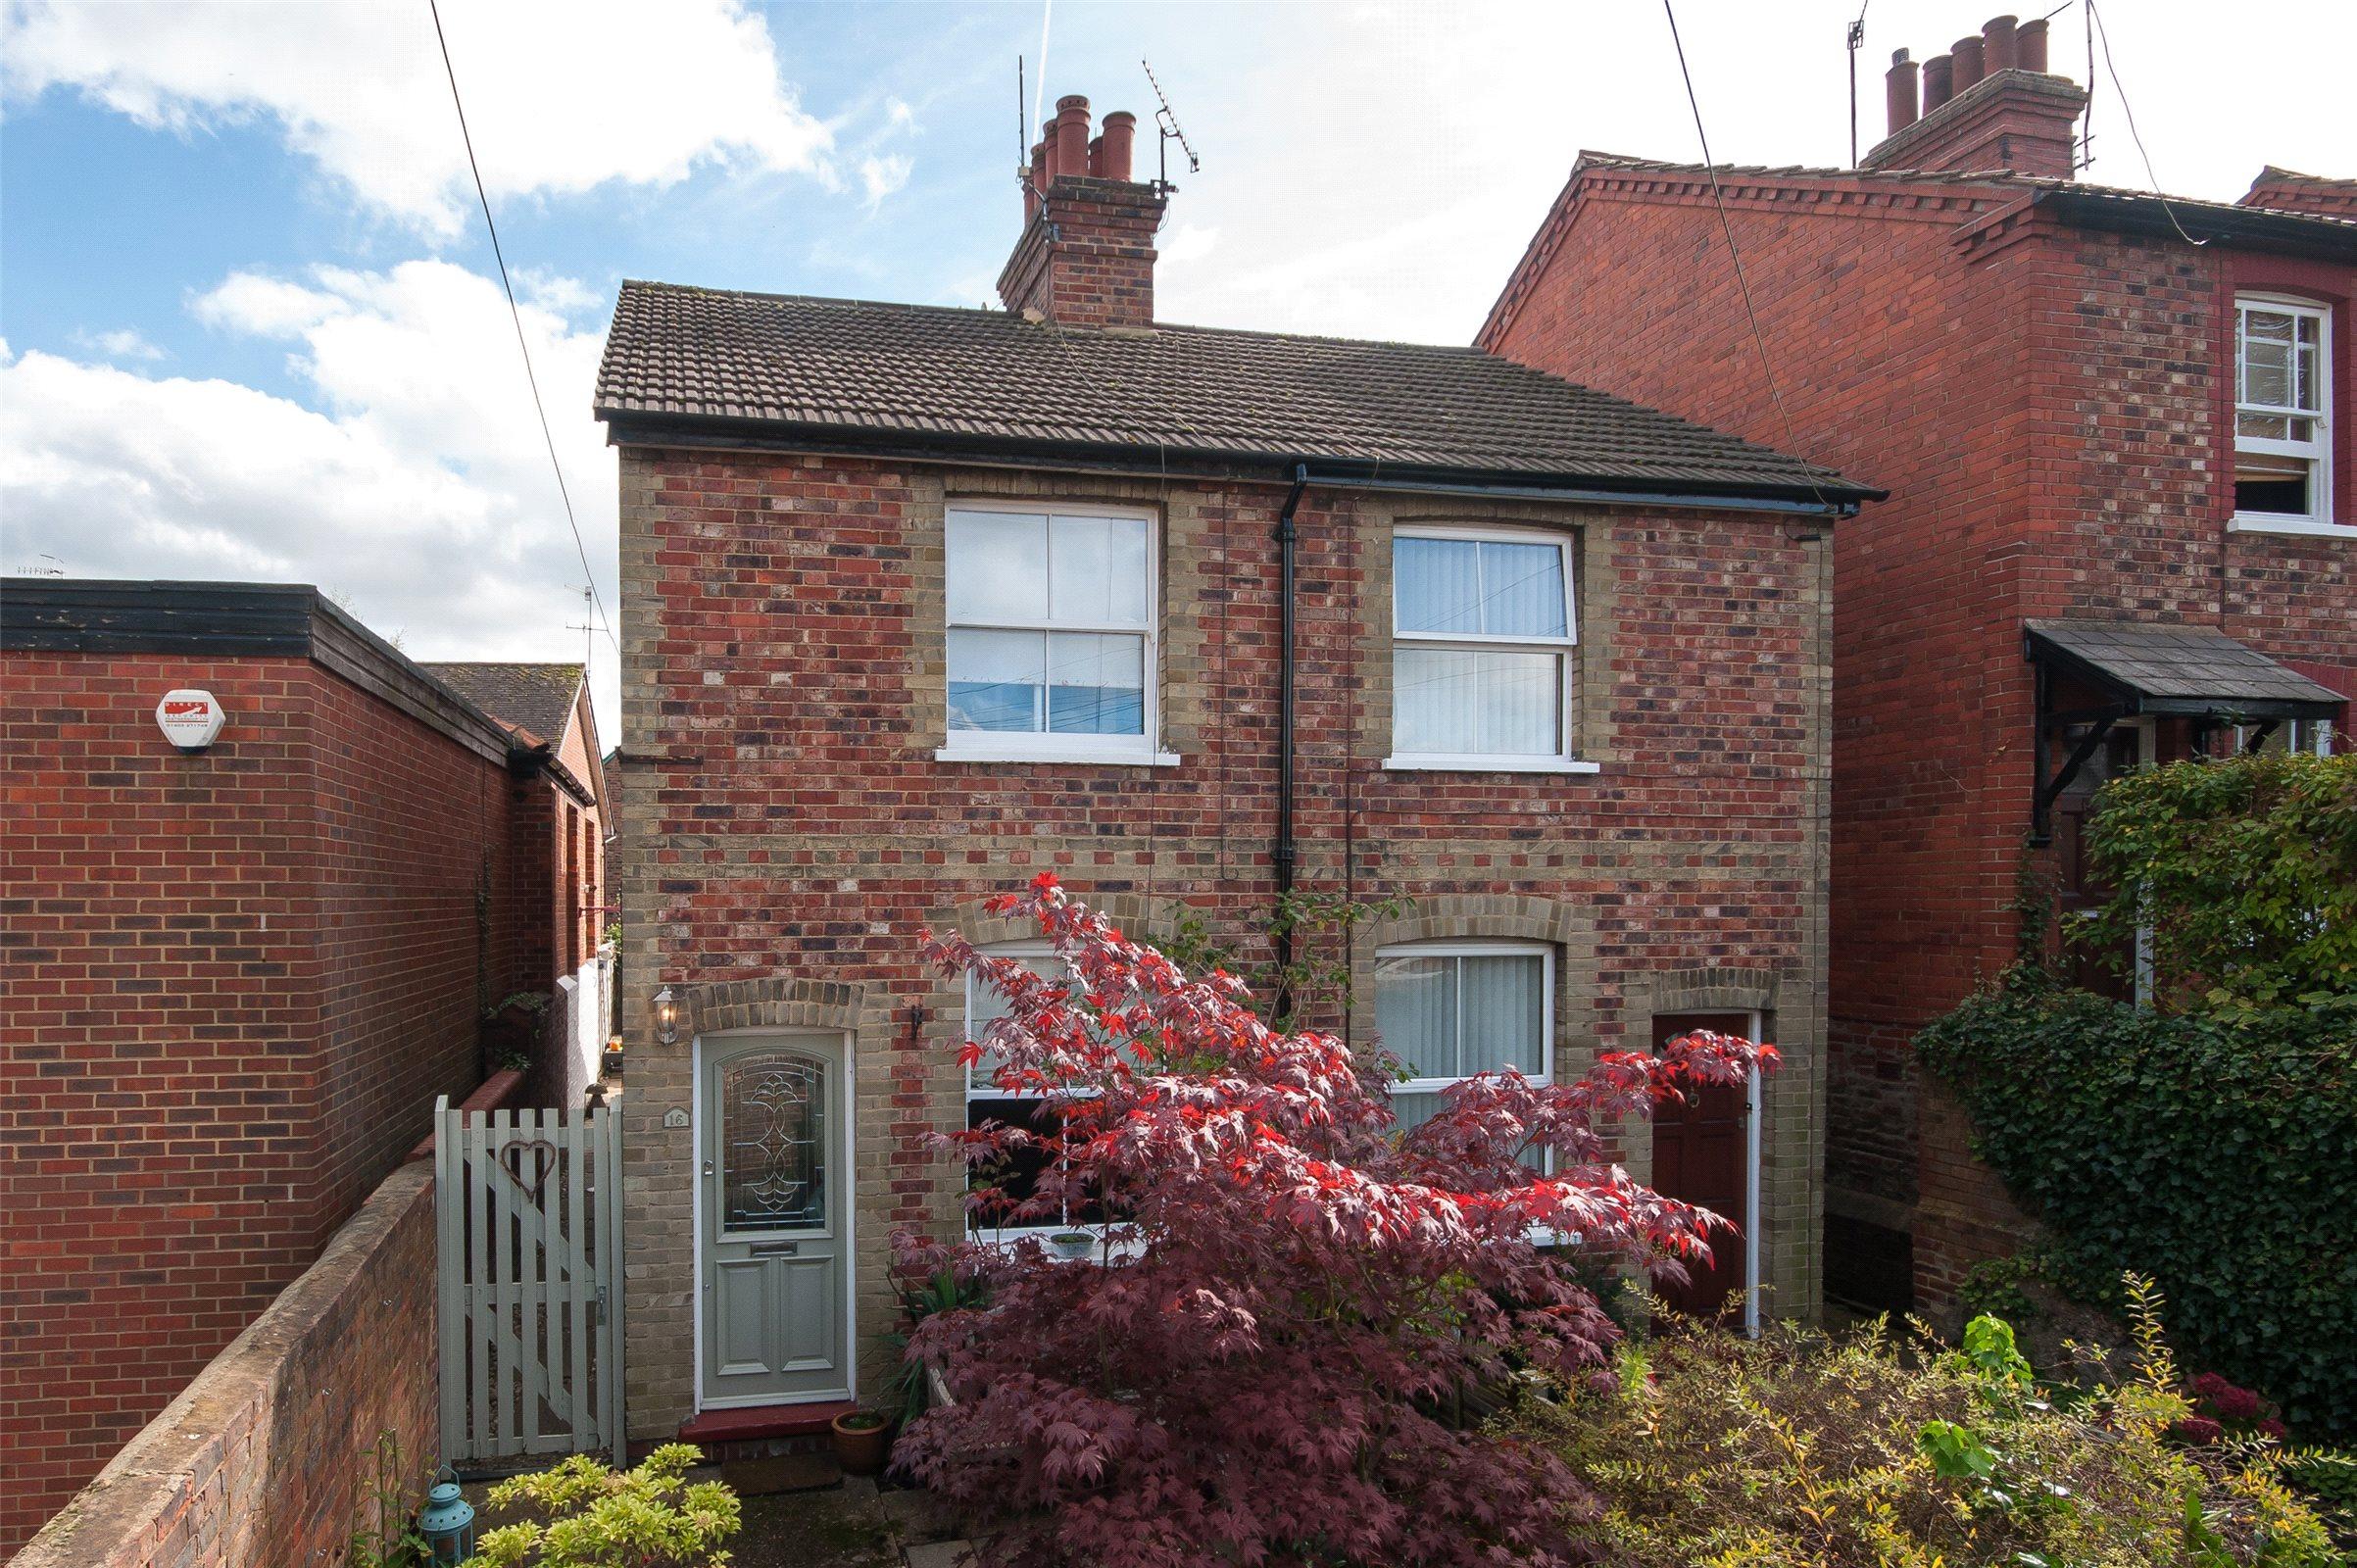 2 Bedrooms Terraced House for sale in Dene Street Gardens, Dorking, Surrey, RH4